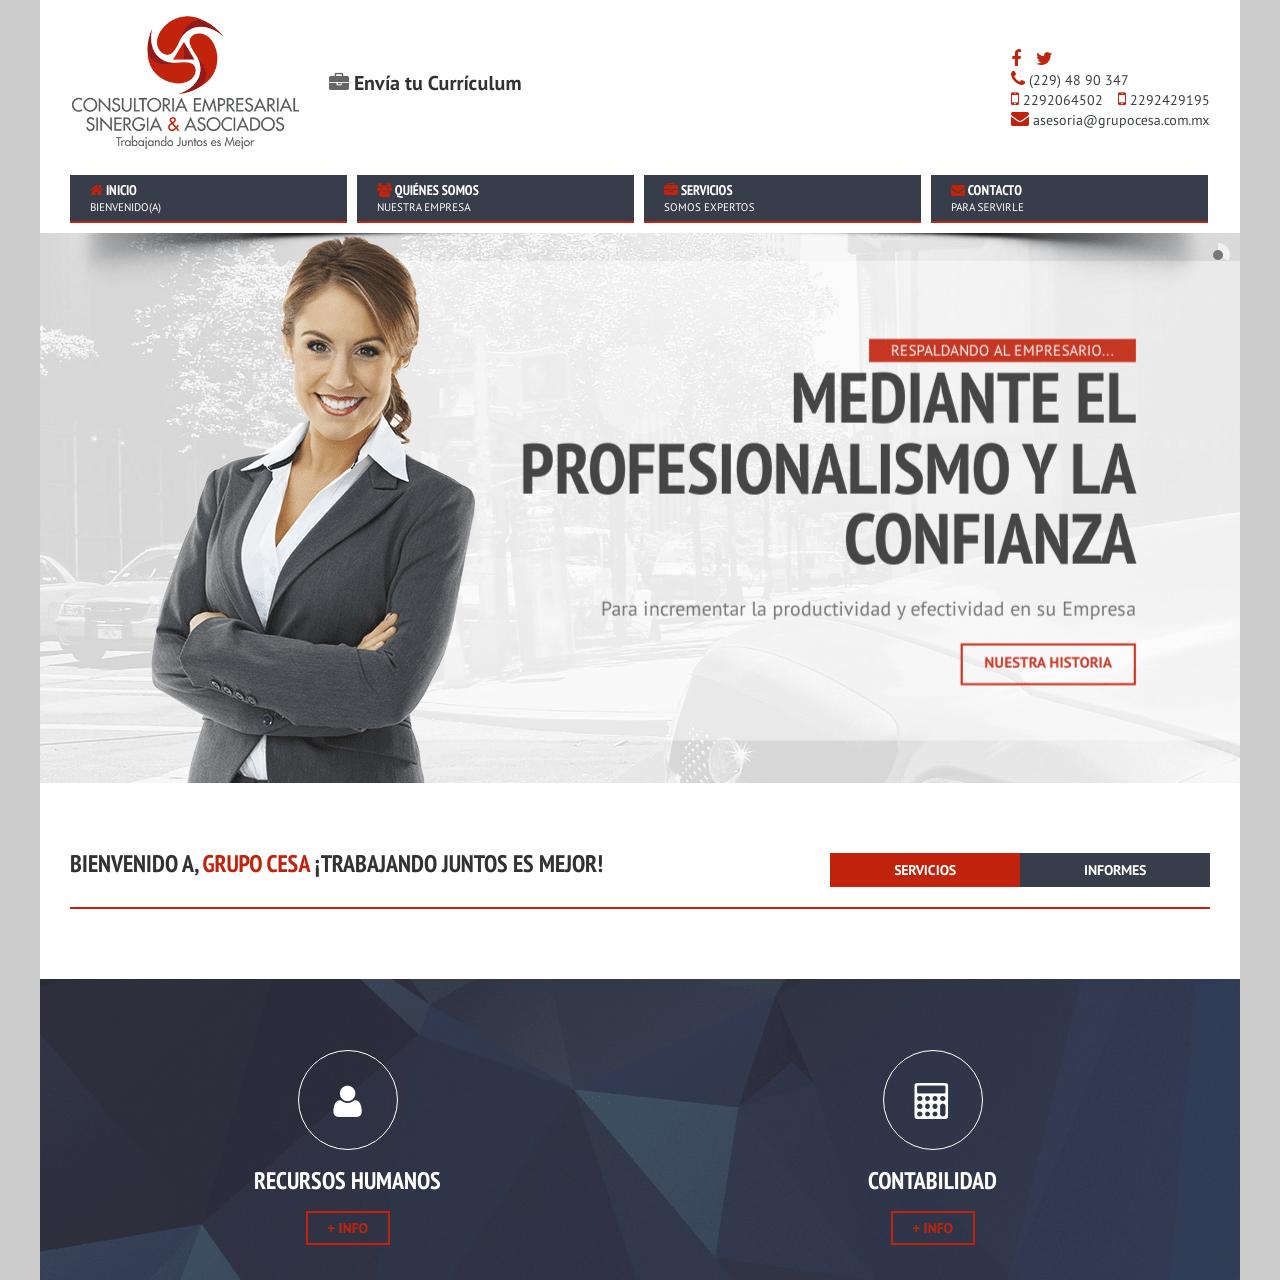 www.grupocesa.com.mx